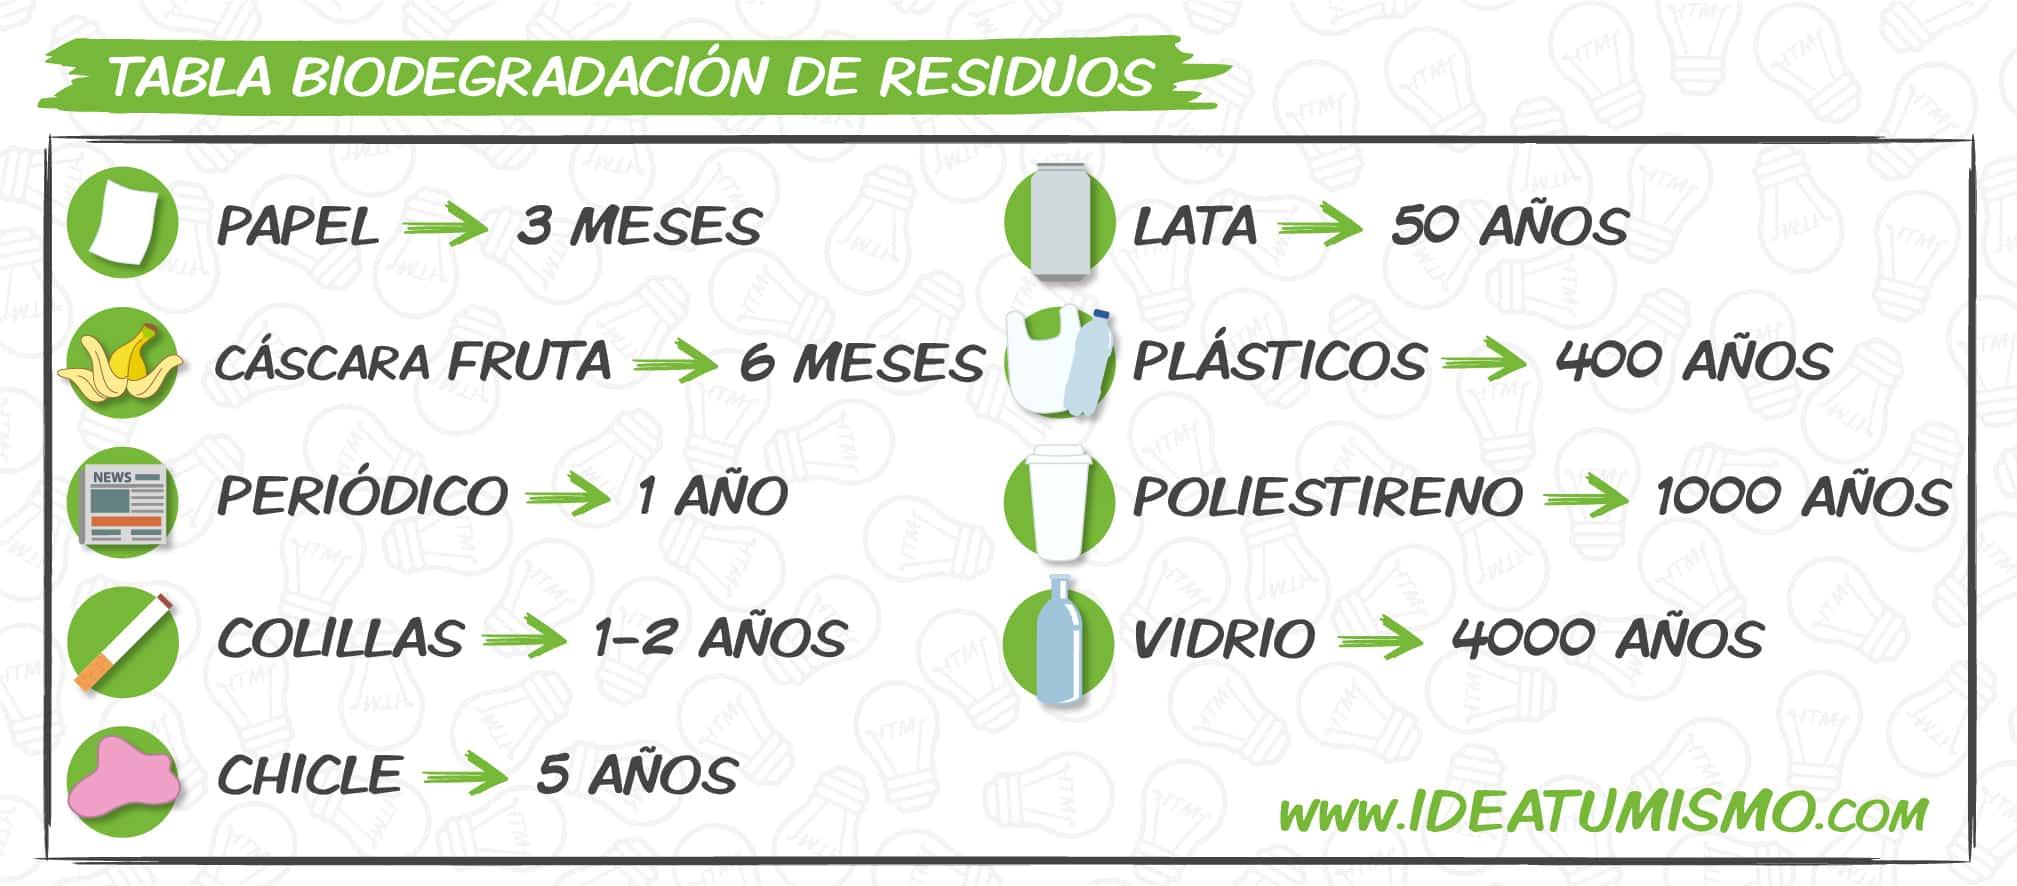 biodegradacion-residuos